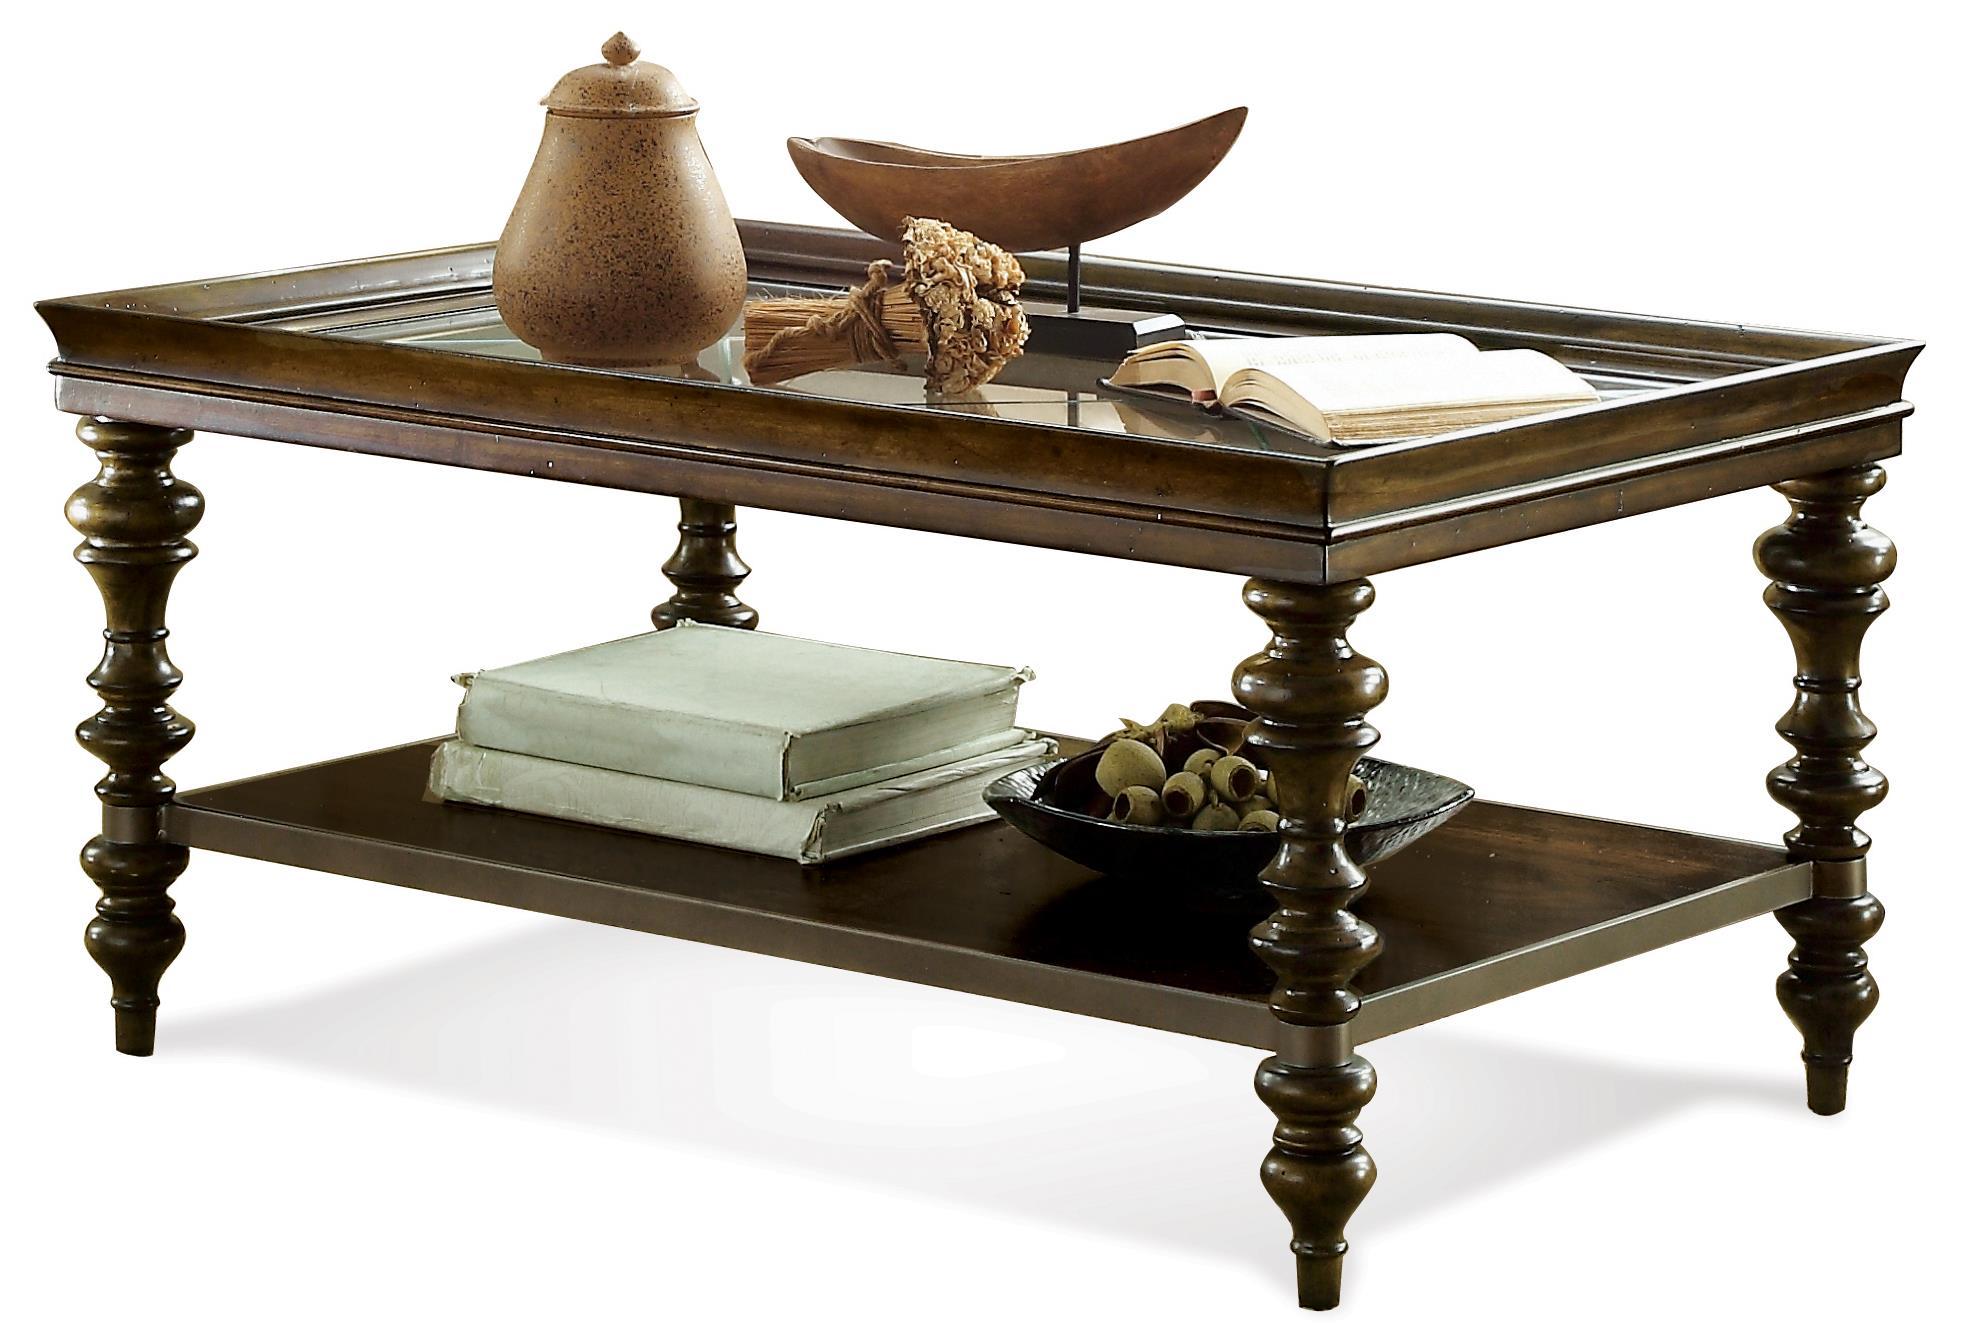 Riverside Furniture Windermier Rectangular Coffee Table   Item Number: 19802